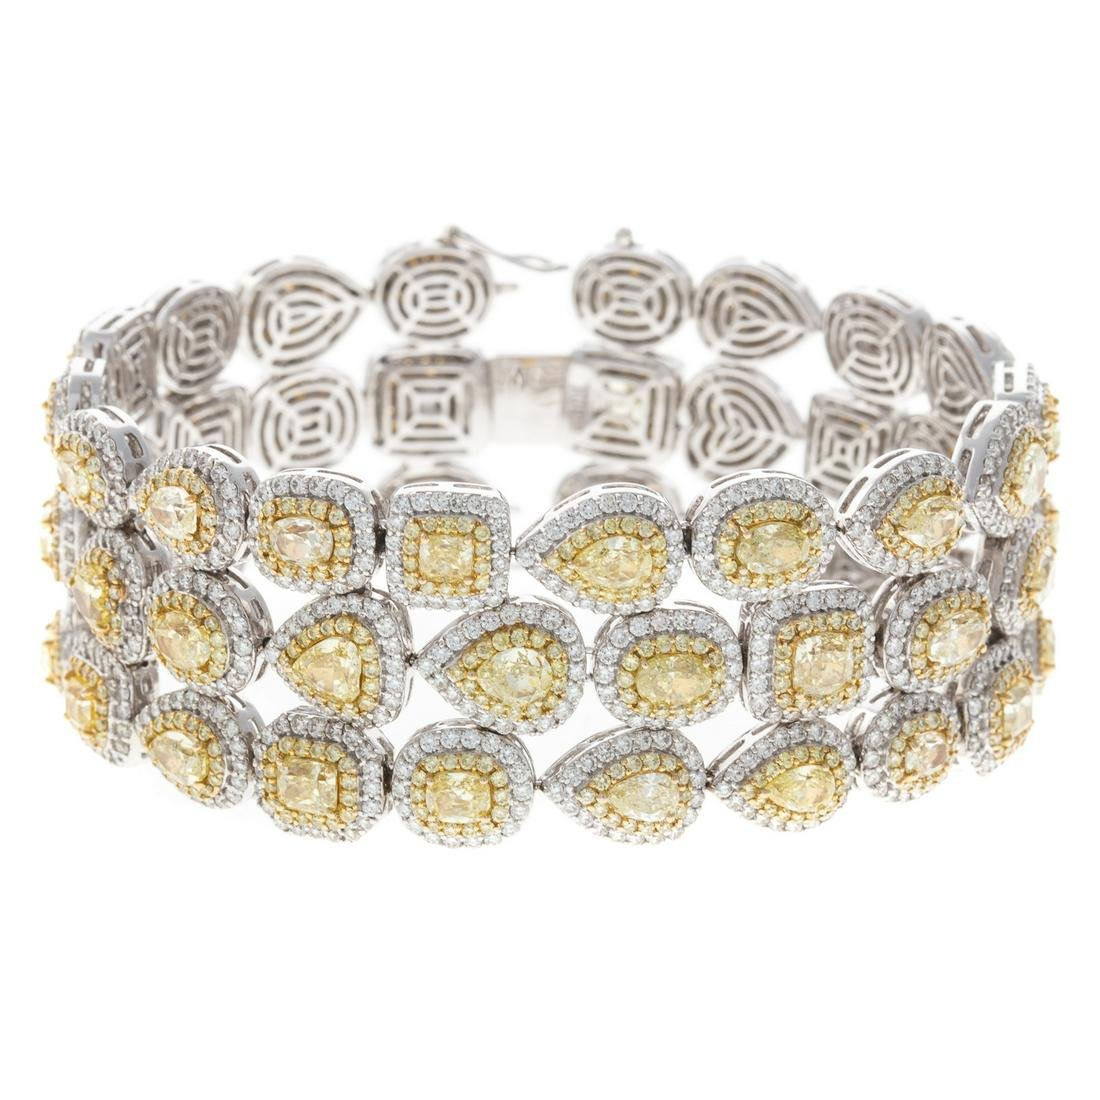 A 31.21ct Yellow & White Diamond Bracelet in 18K